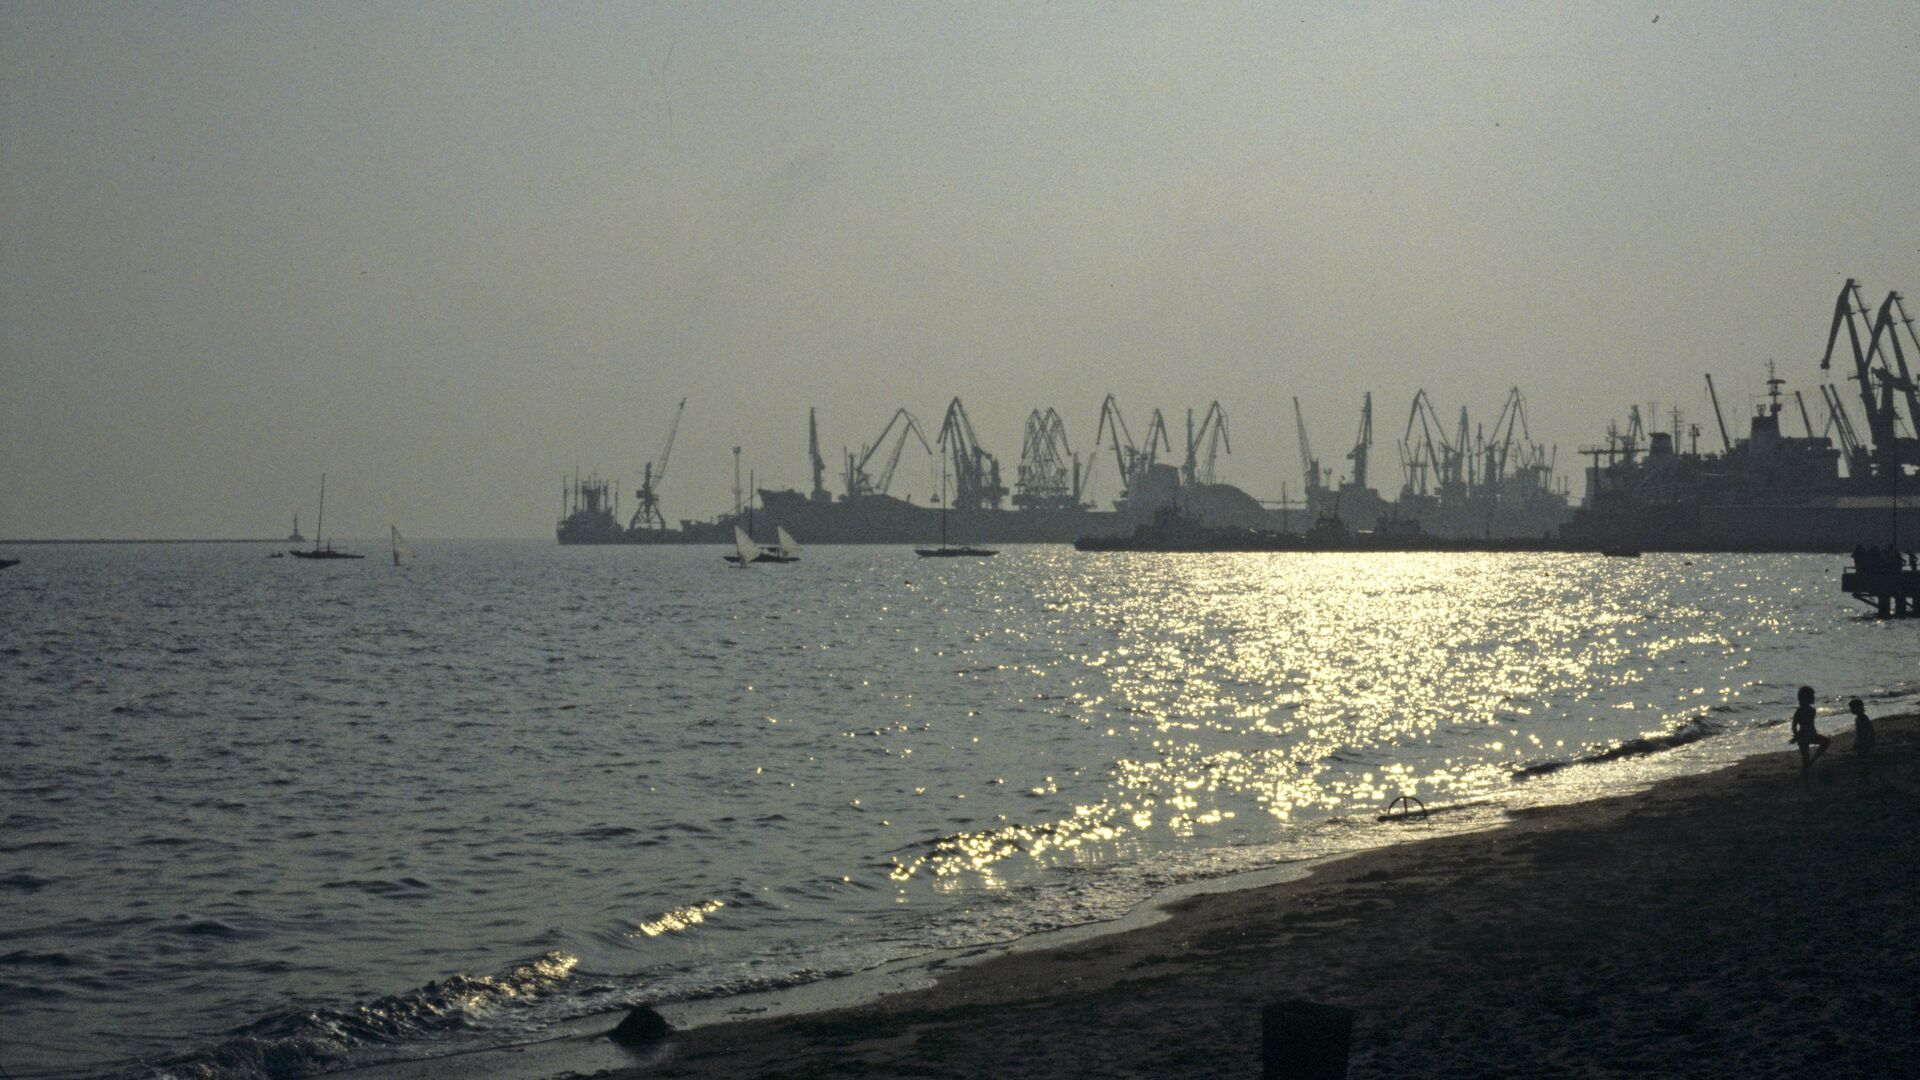 Бердянский морской порт - РИА Новости, 1920, 12.04.2021